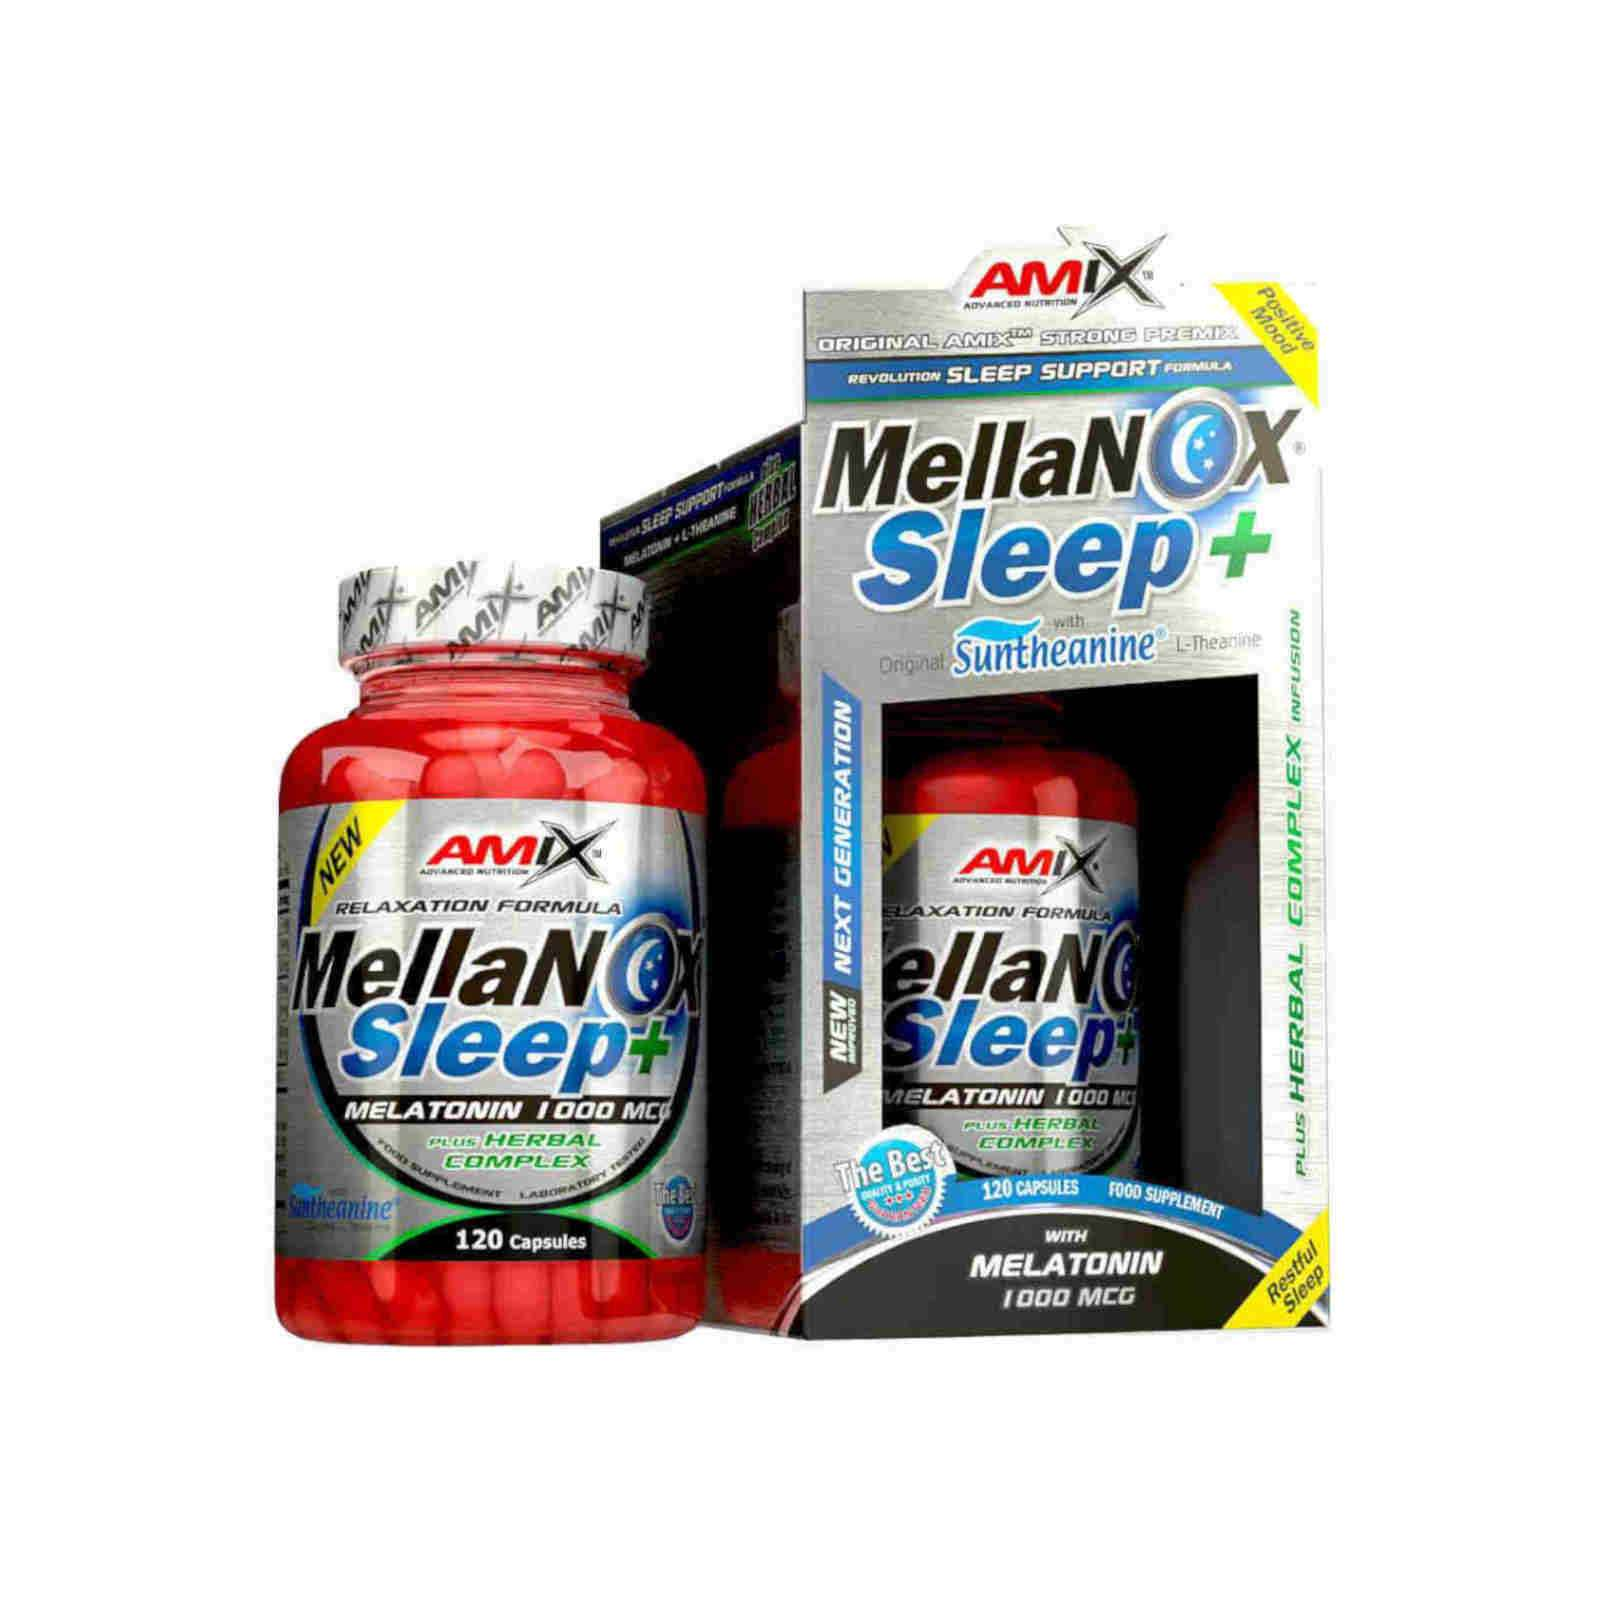 MELLANOX SLEEP  - 120 caps